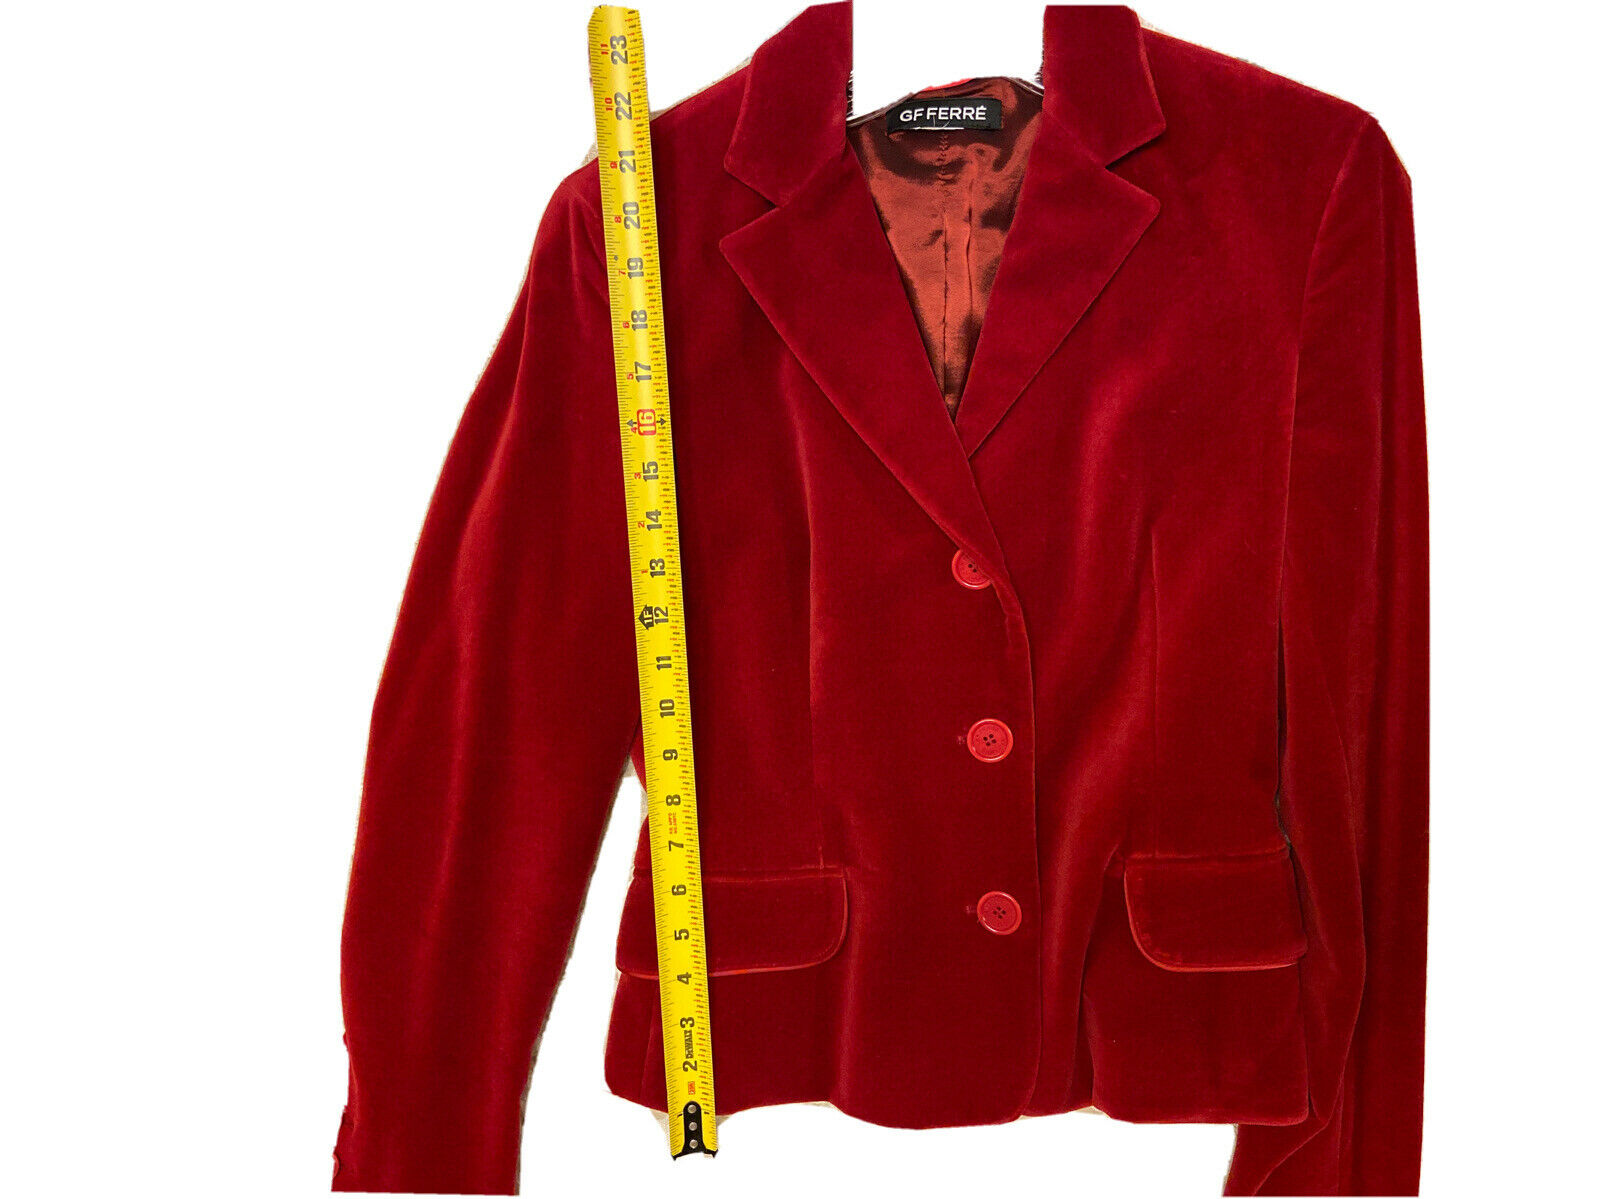 GF FERRE Vintage Red Velvet Velour Jacket Blazer … - image 8